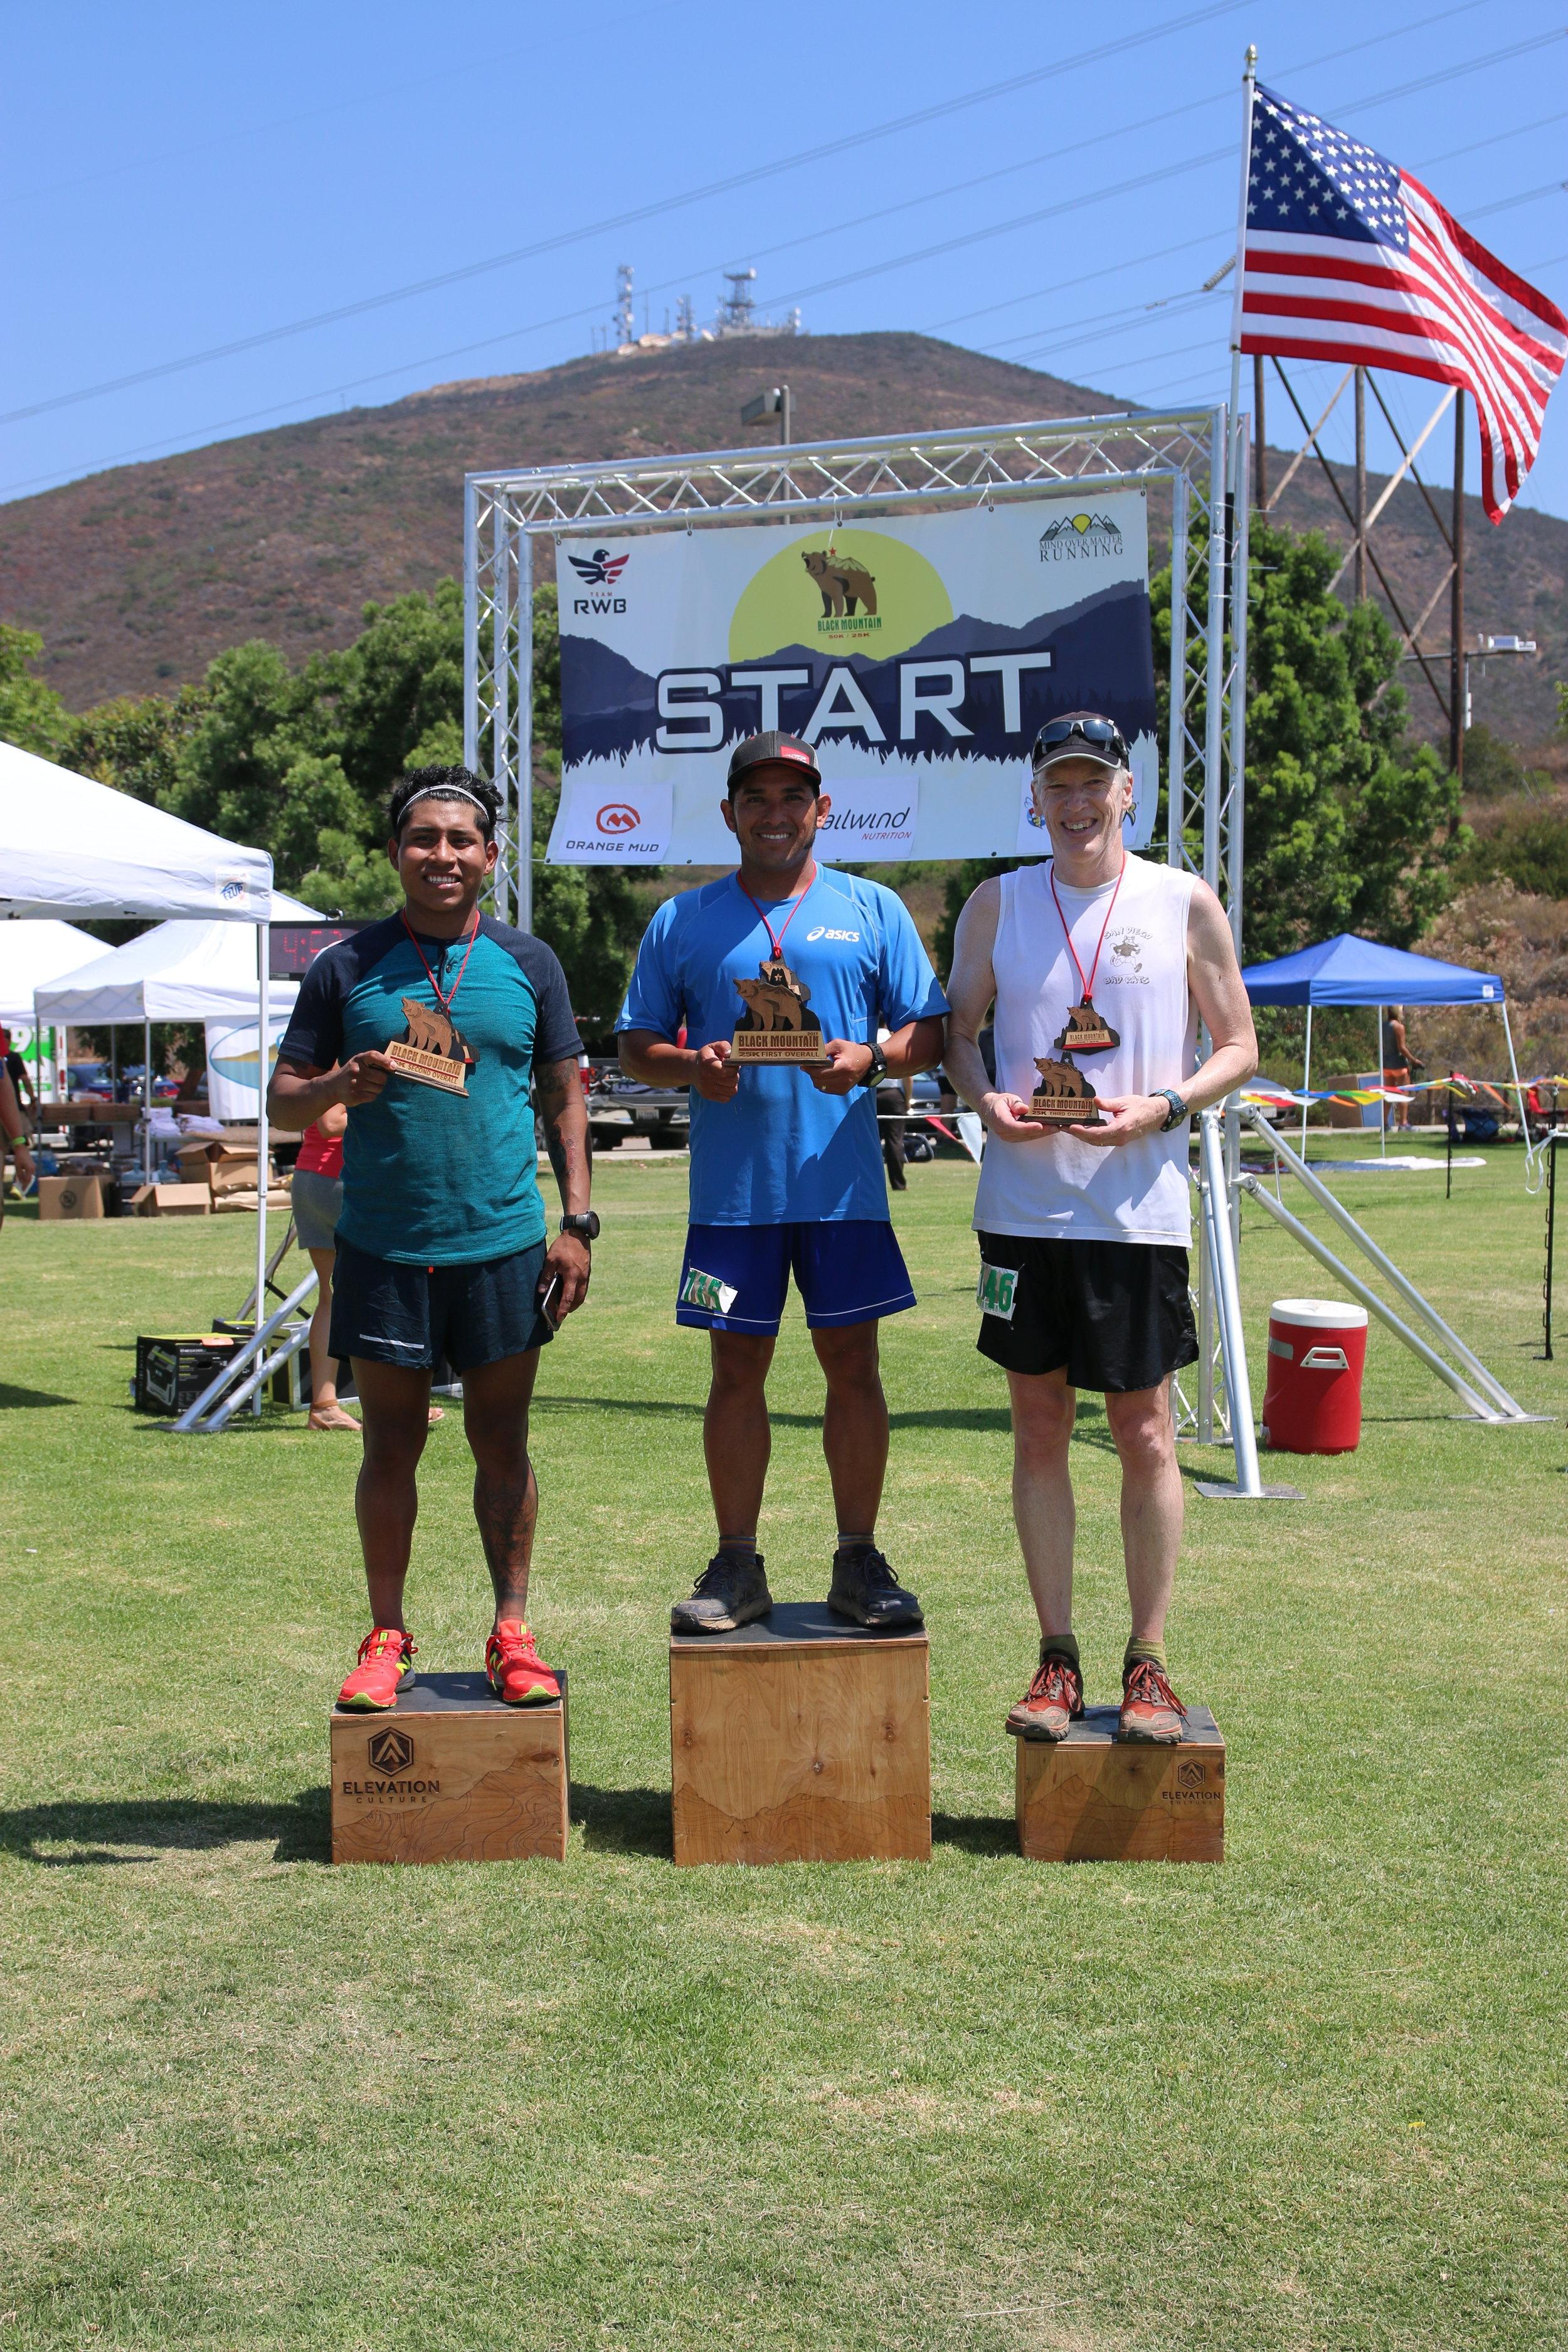 25K Winners: Beto Campos, Pablo Salmeron, and Wade Blomgren